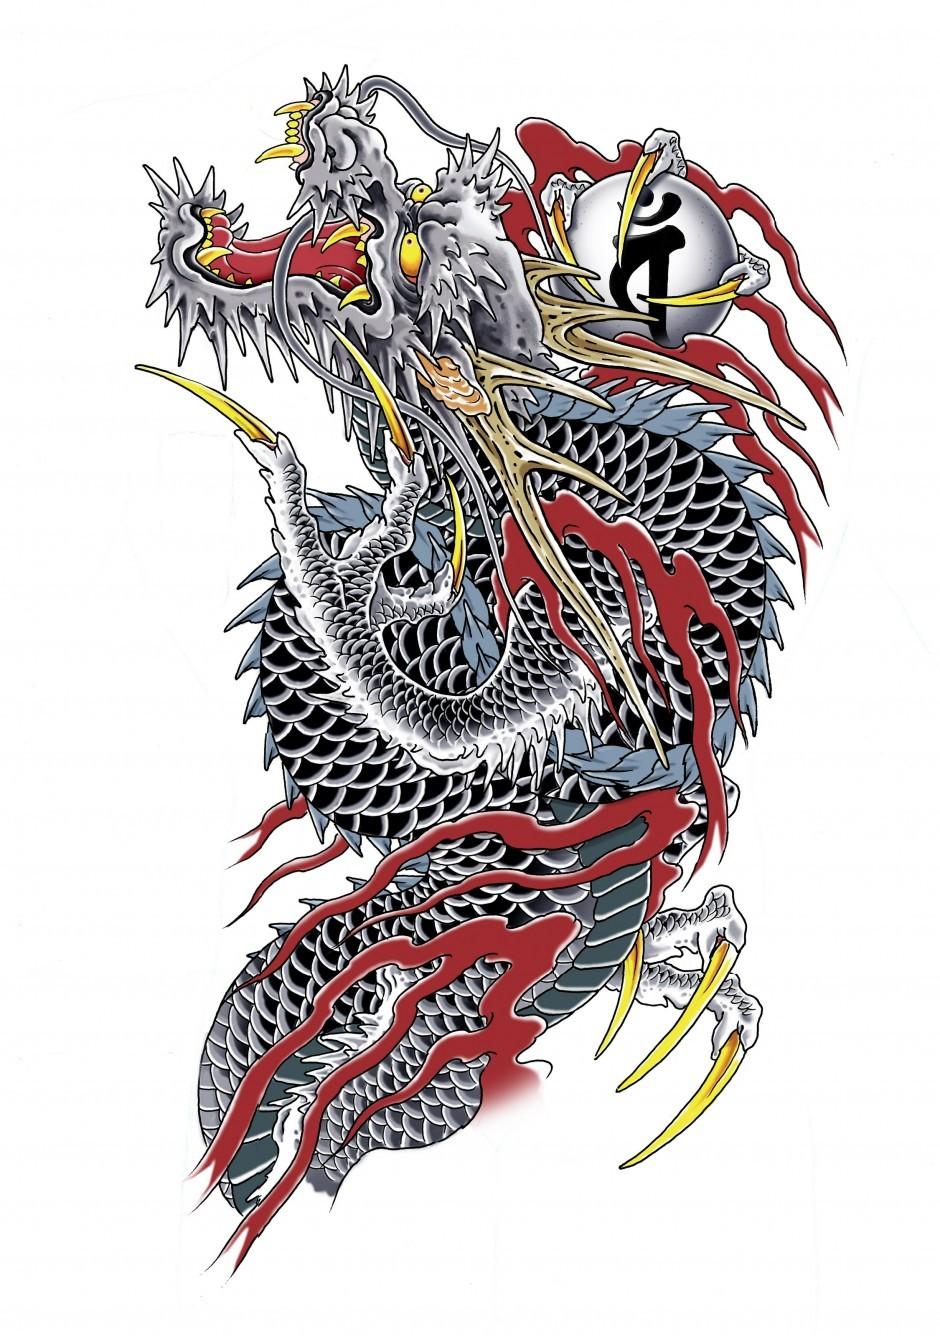 [img]https://vignette.wikia.nocookie.net/yakuza/images/9/9f/Kazuma_Kiryu_ouryu_tattoo_complete_design.jpg/revision/latest?cb=20130220212751[/img]